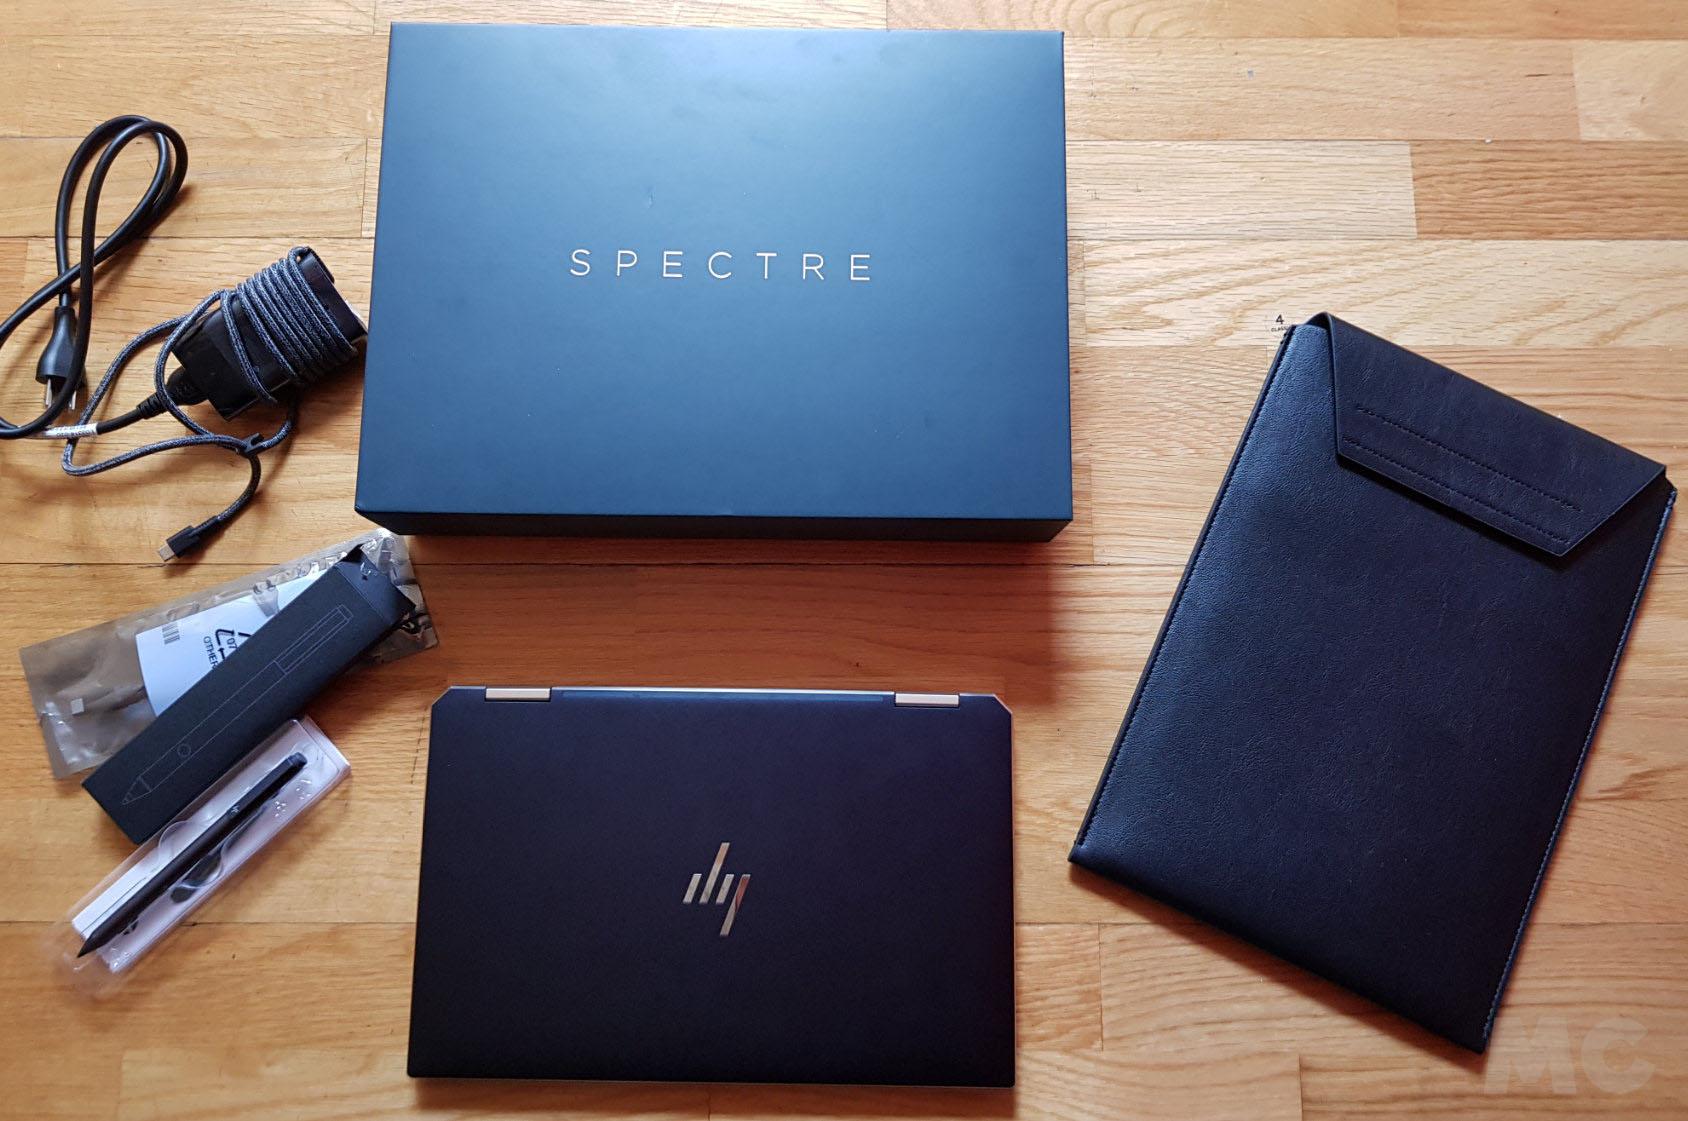 Spectre x360 13